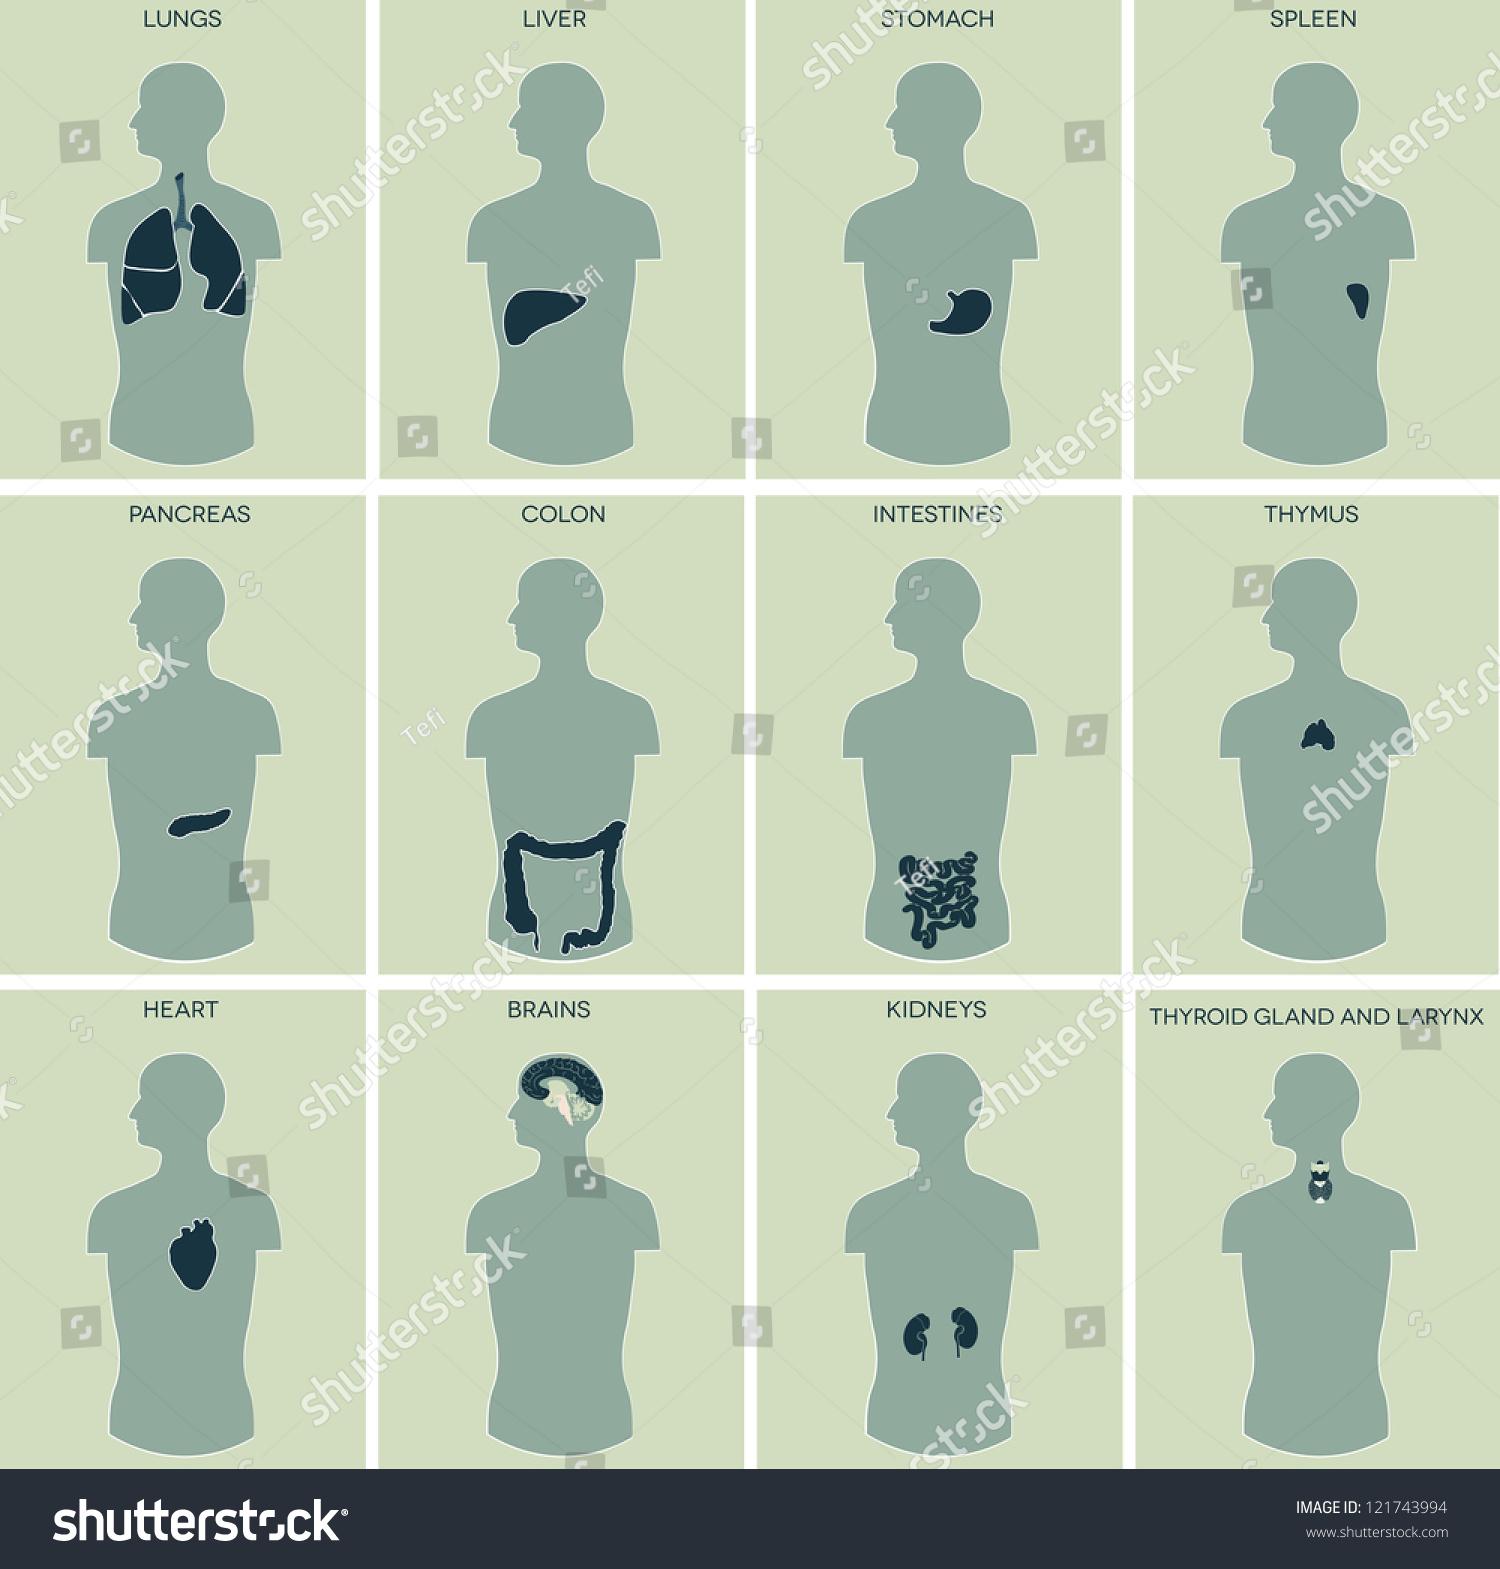 Human Anatomy Detailed Diagram Of Various Human Organs